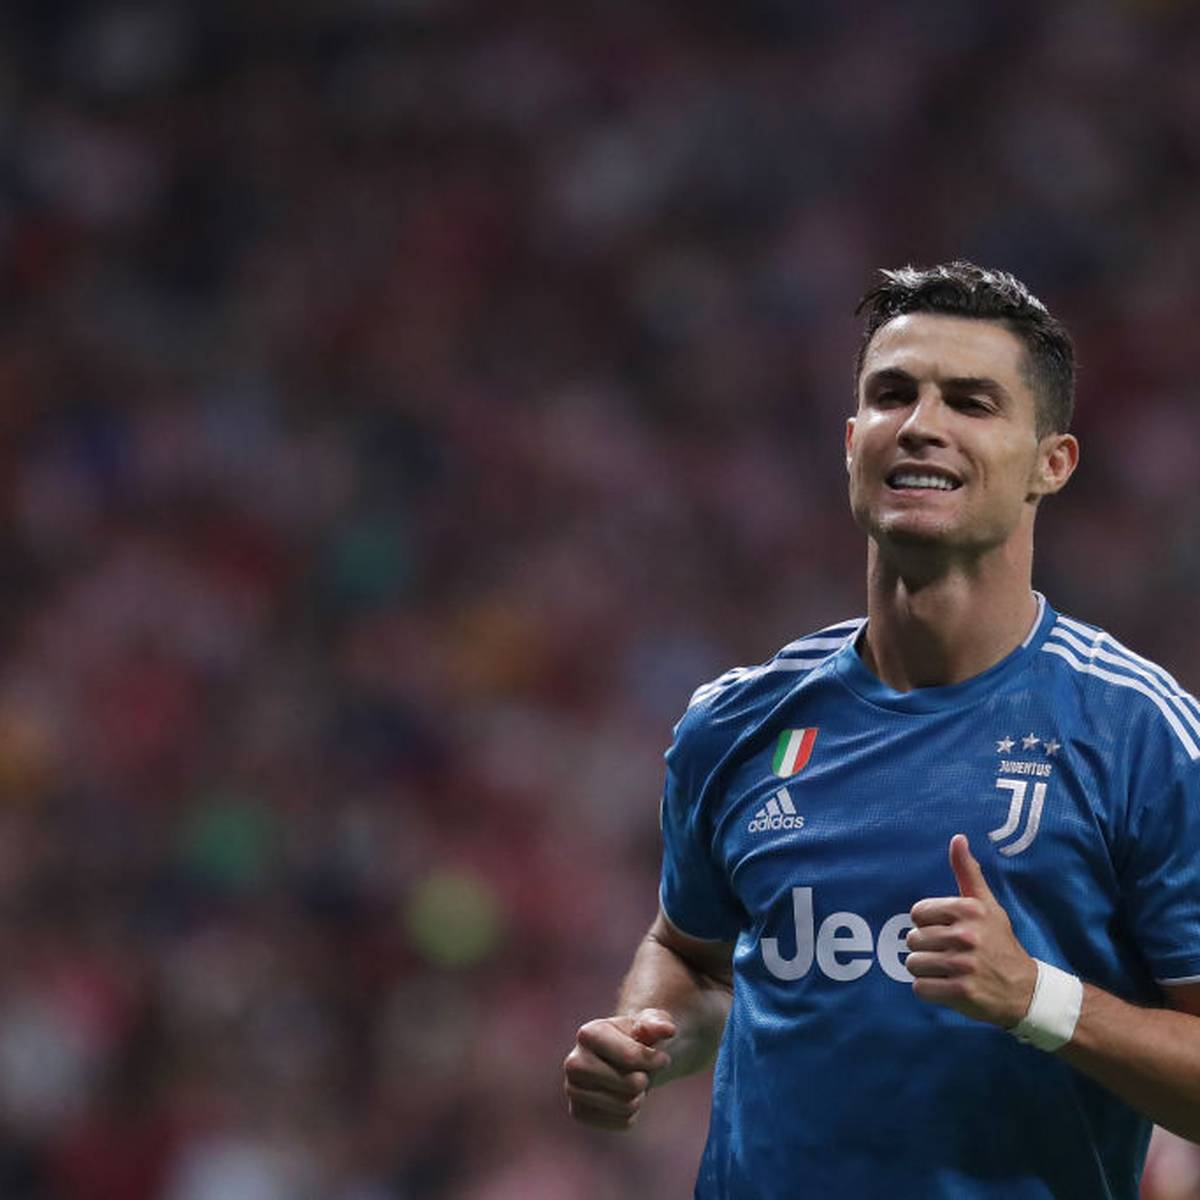 Warum Ronaldo um Burger bettelte